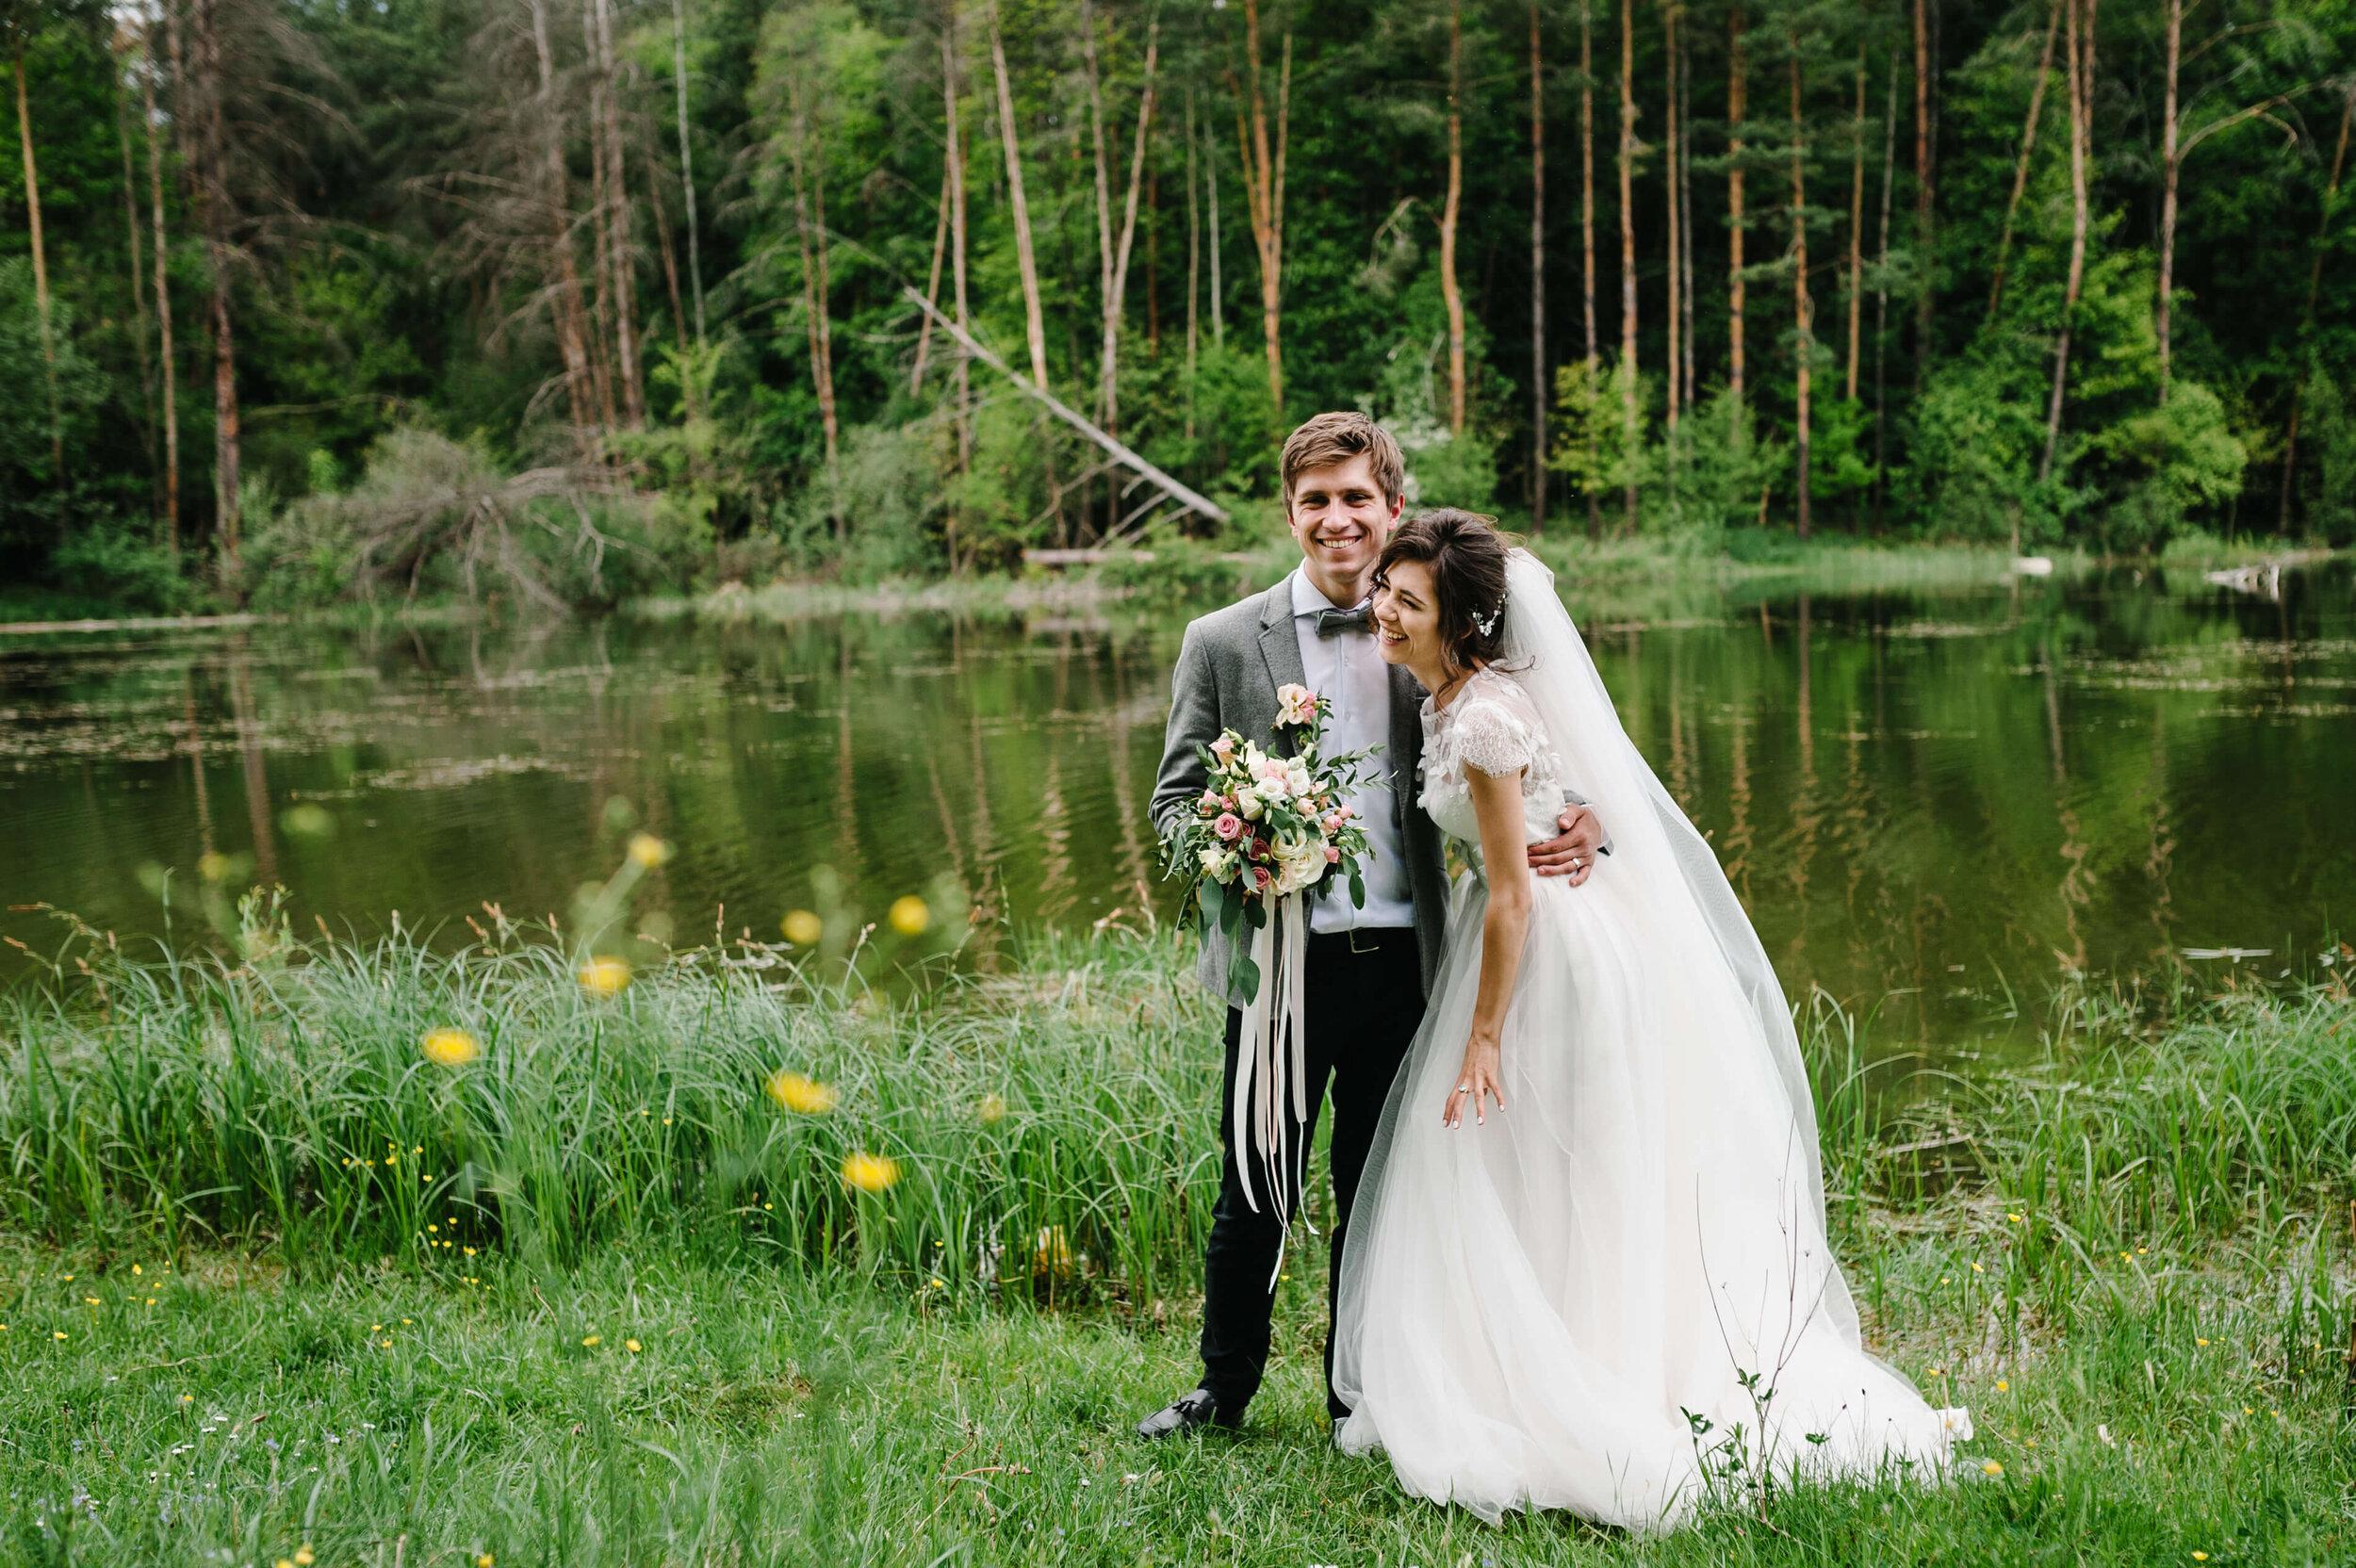 Nondenominational Wedding Ceremony Ideas Wedding Spot Blog